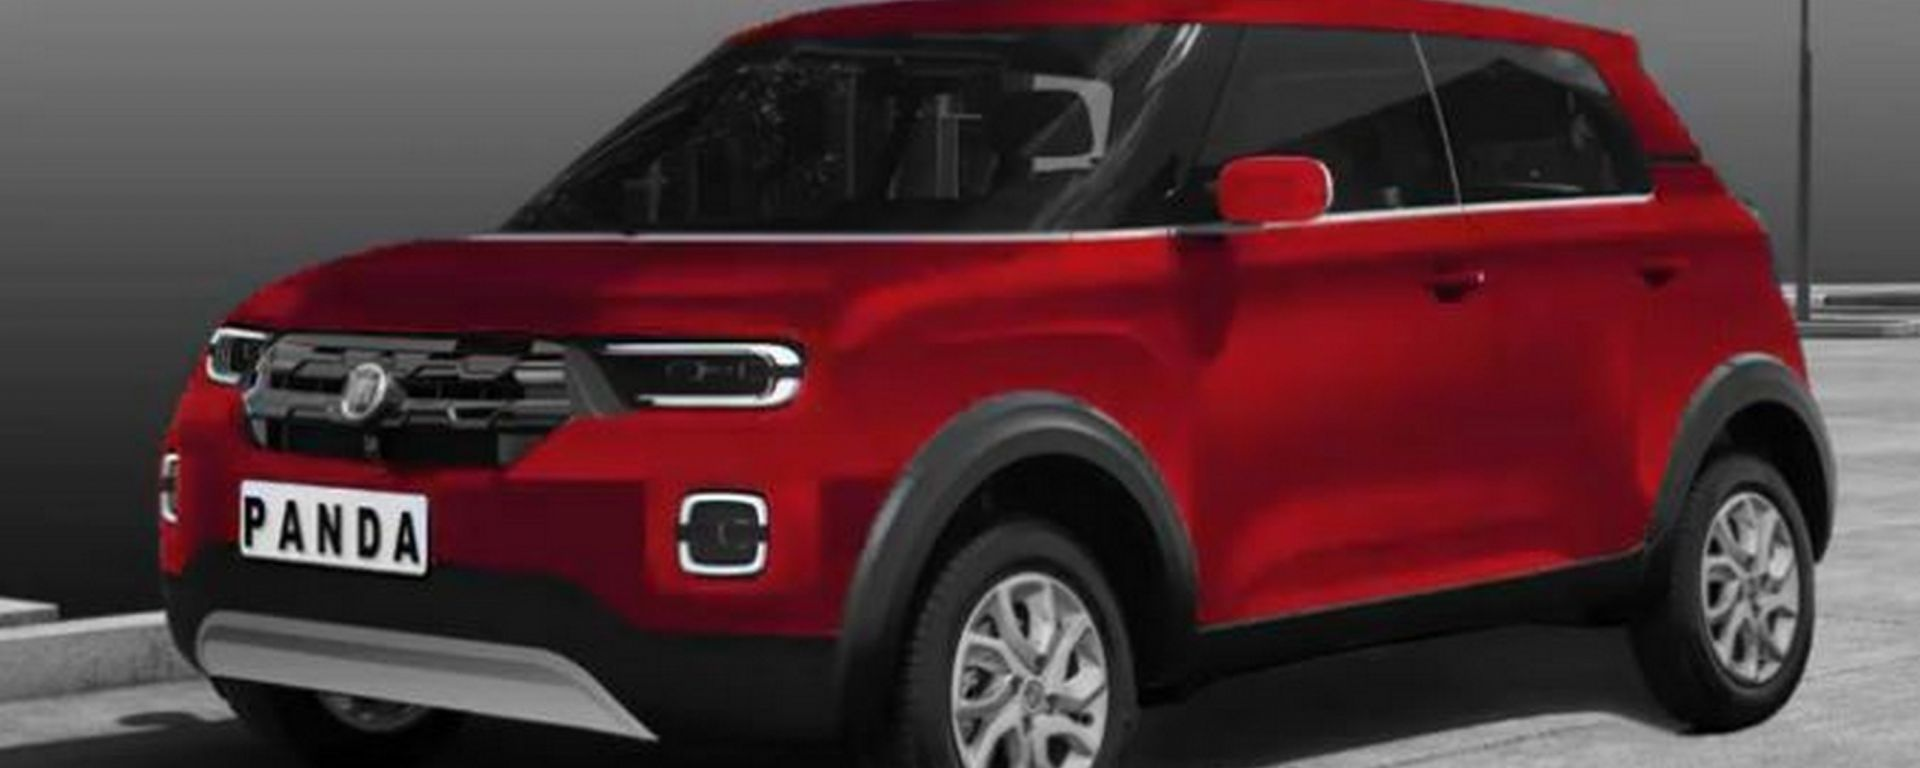 Nuova Fiat Panda, il rendering di CARWP by Jonathan Machado